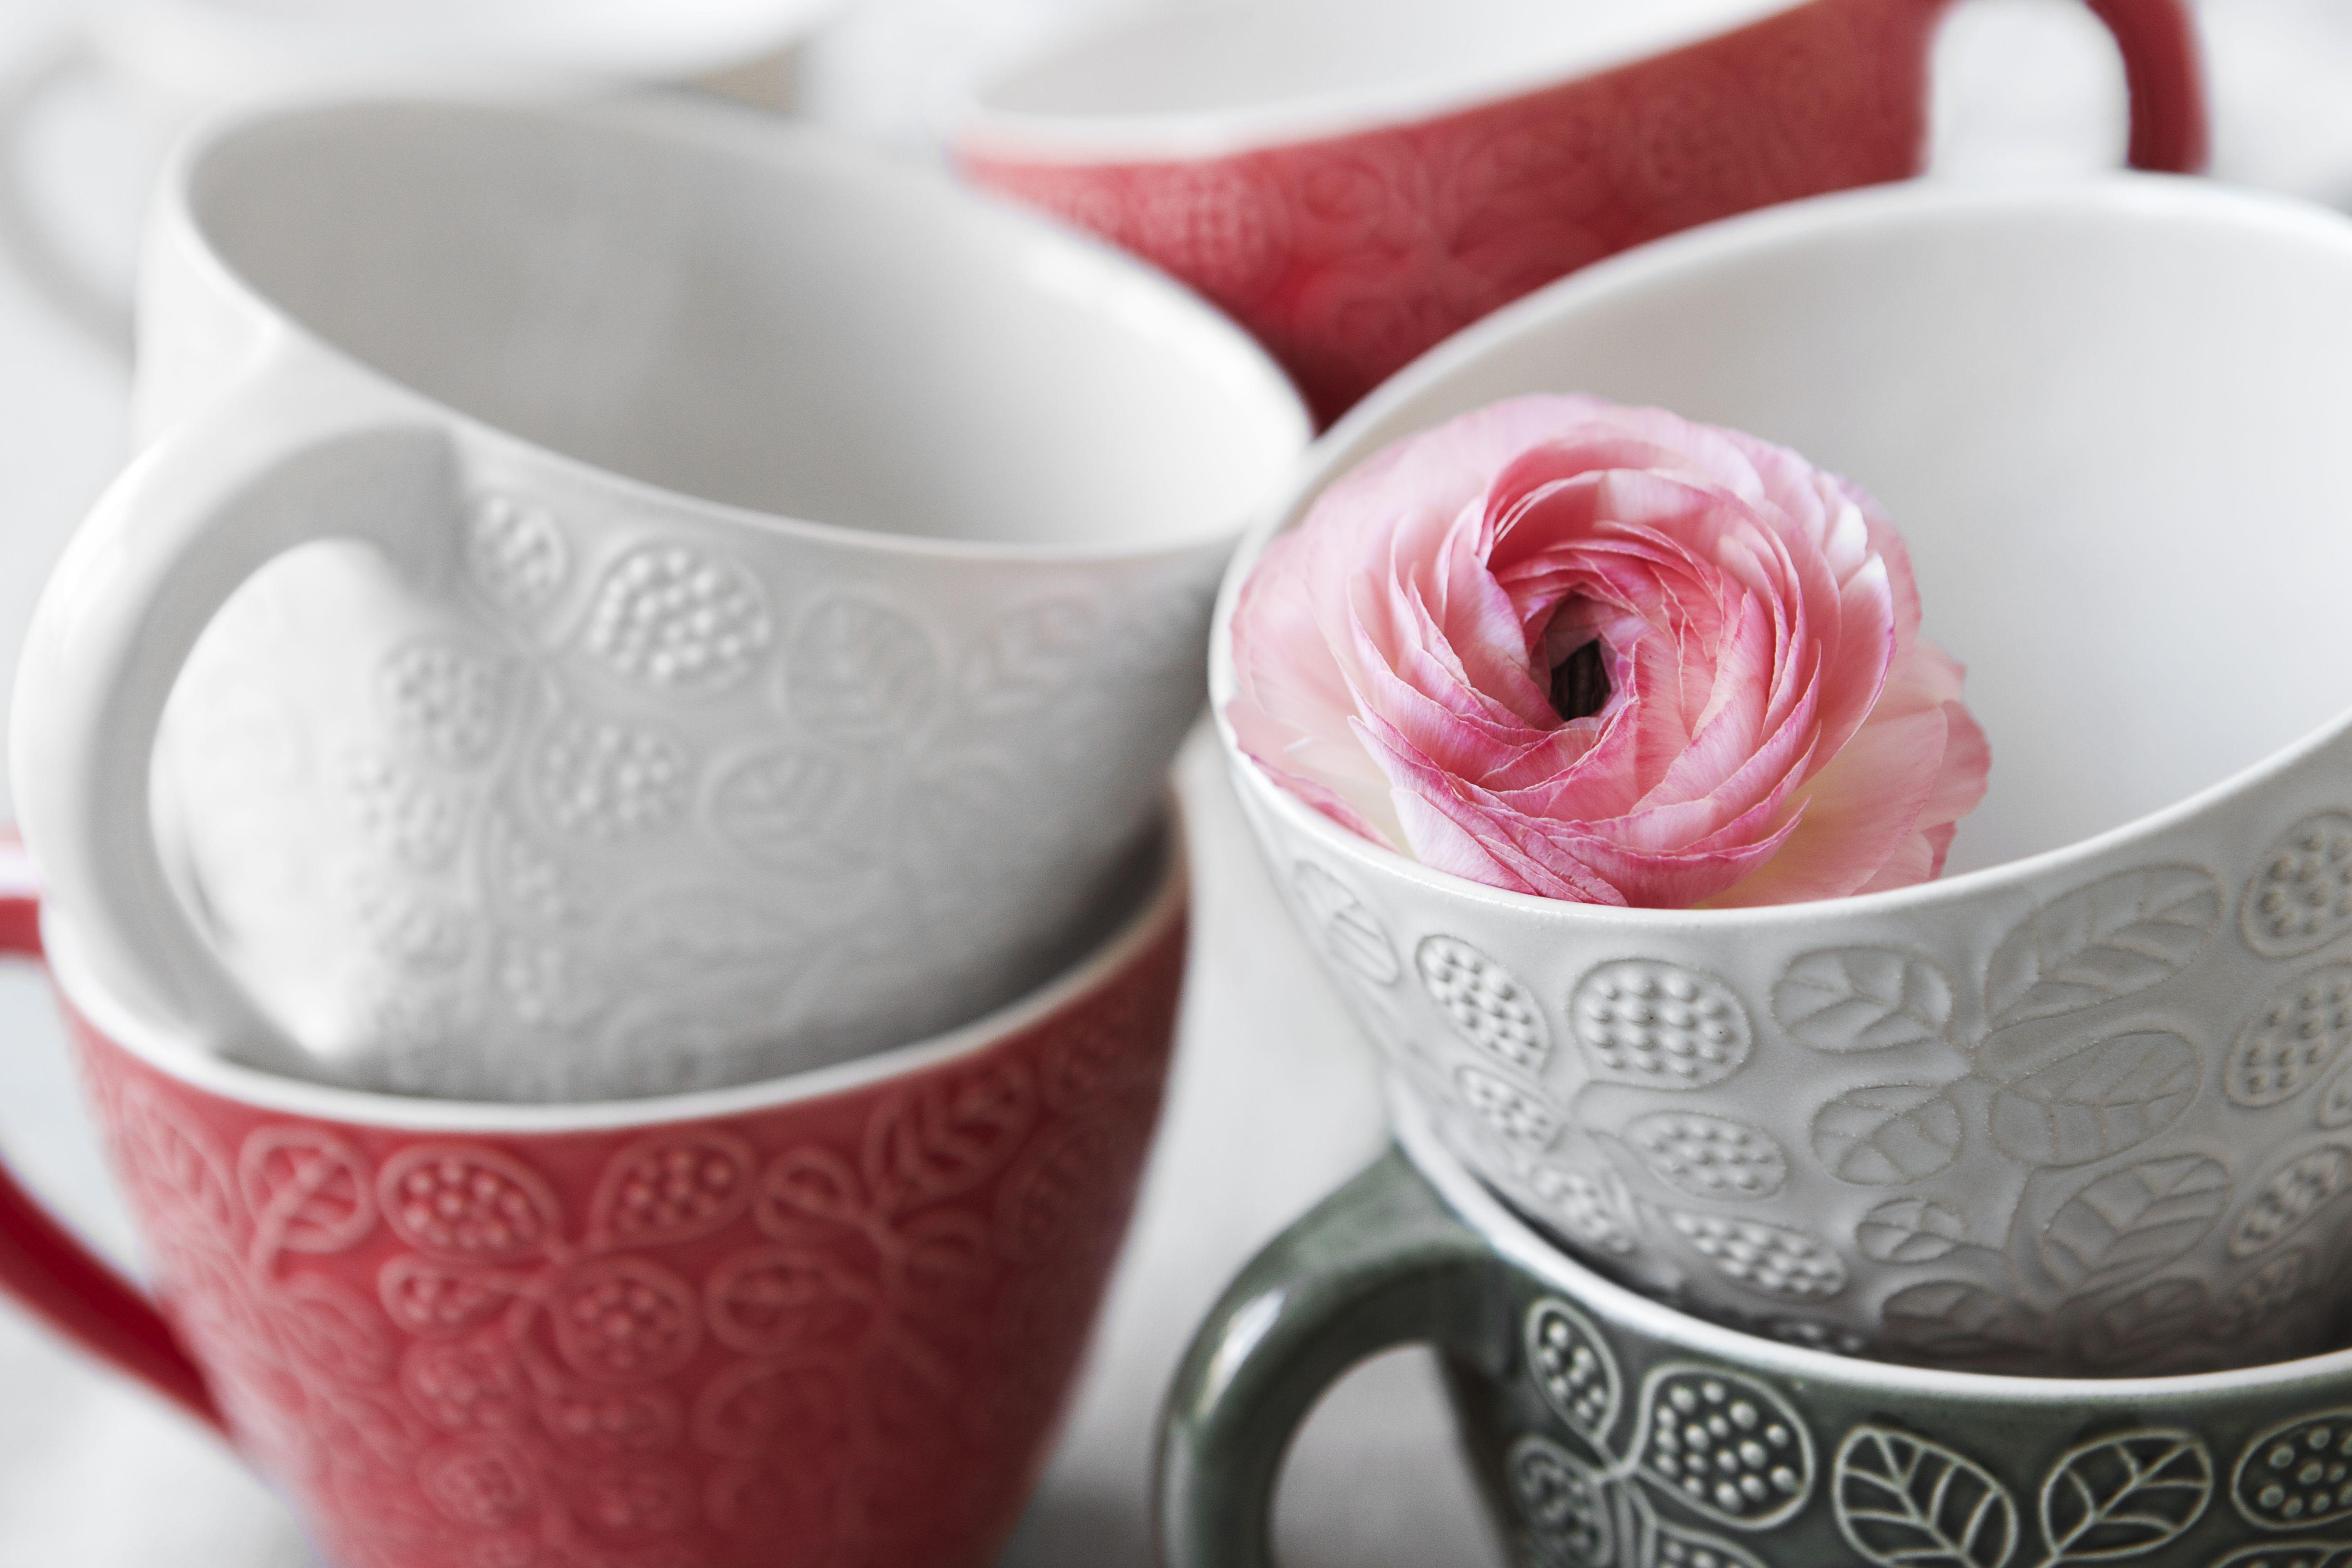 Ceramics by Ulrika Ahlsten  Photo by Jeanette Hägglund